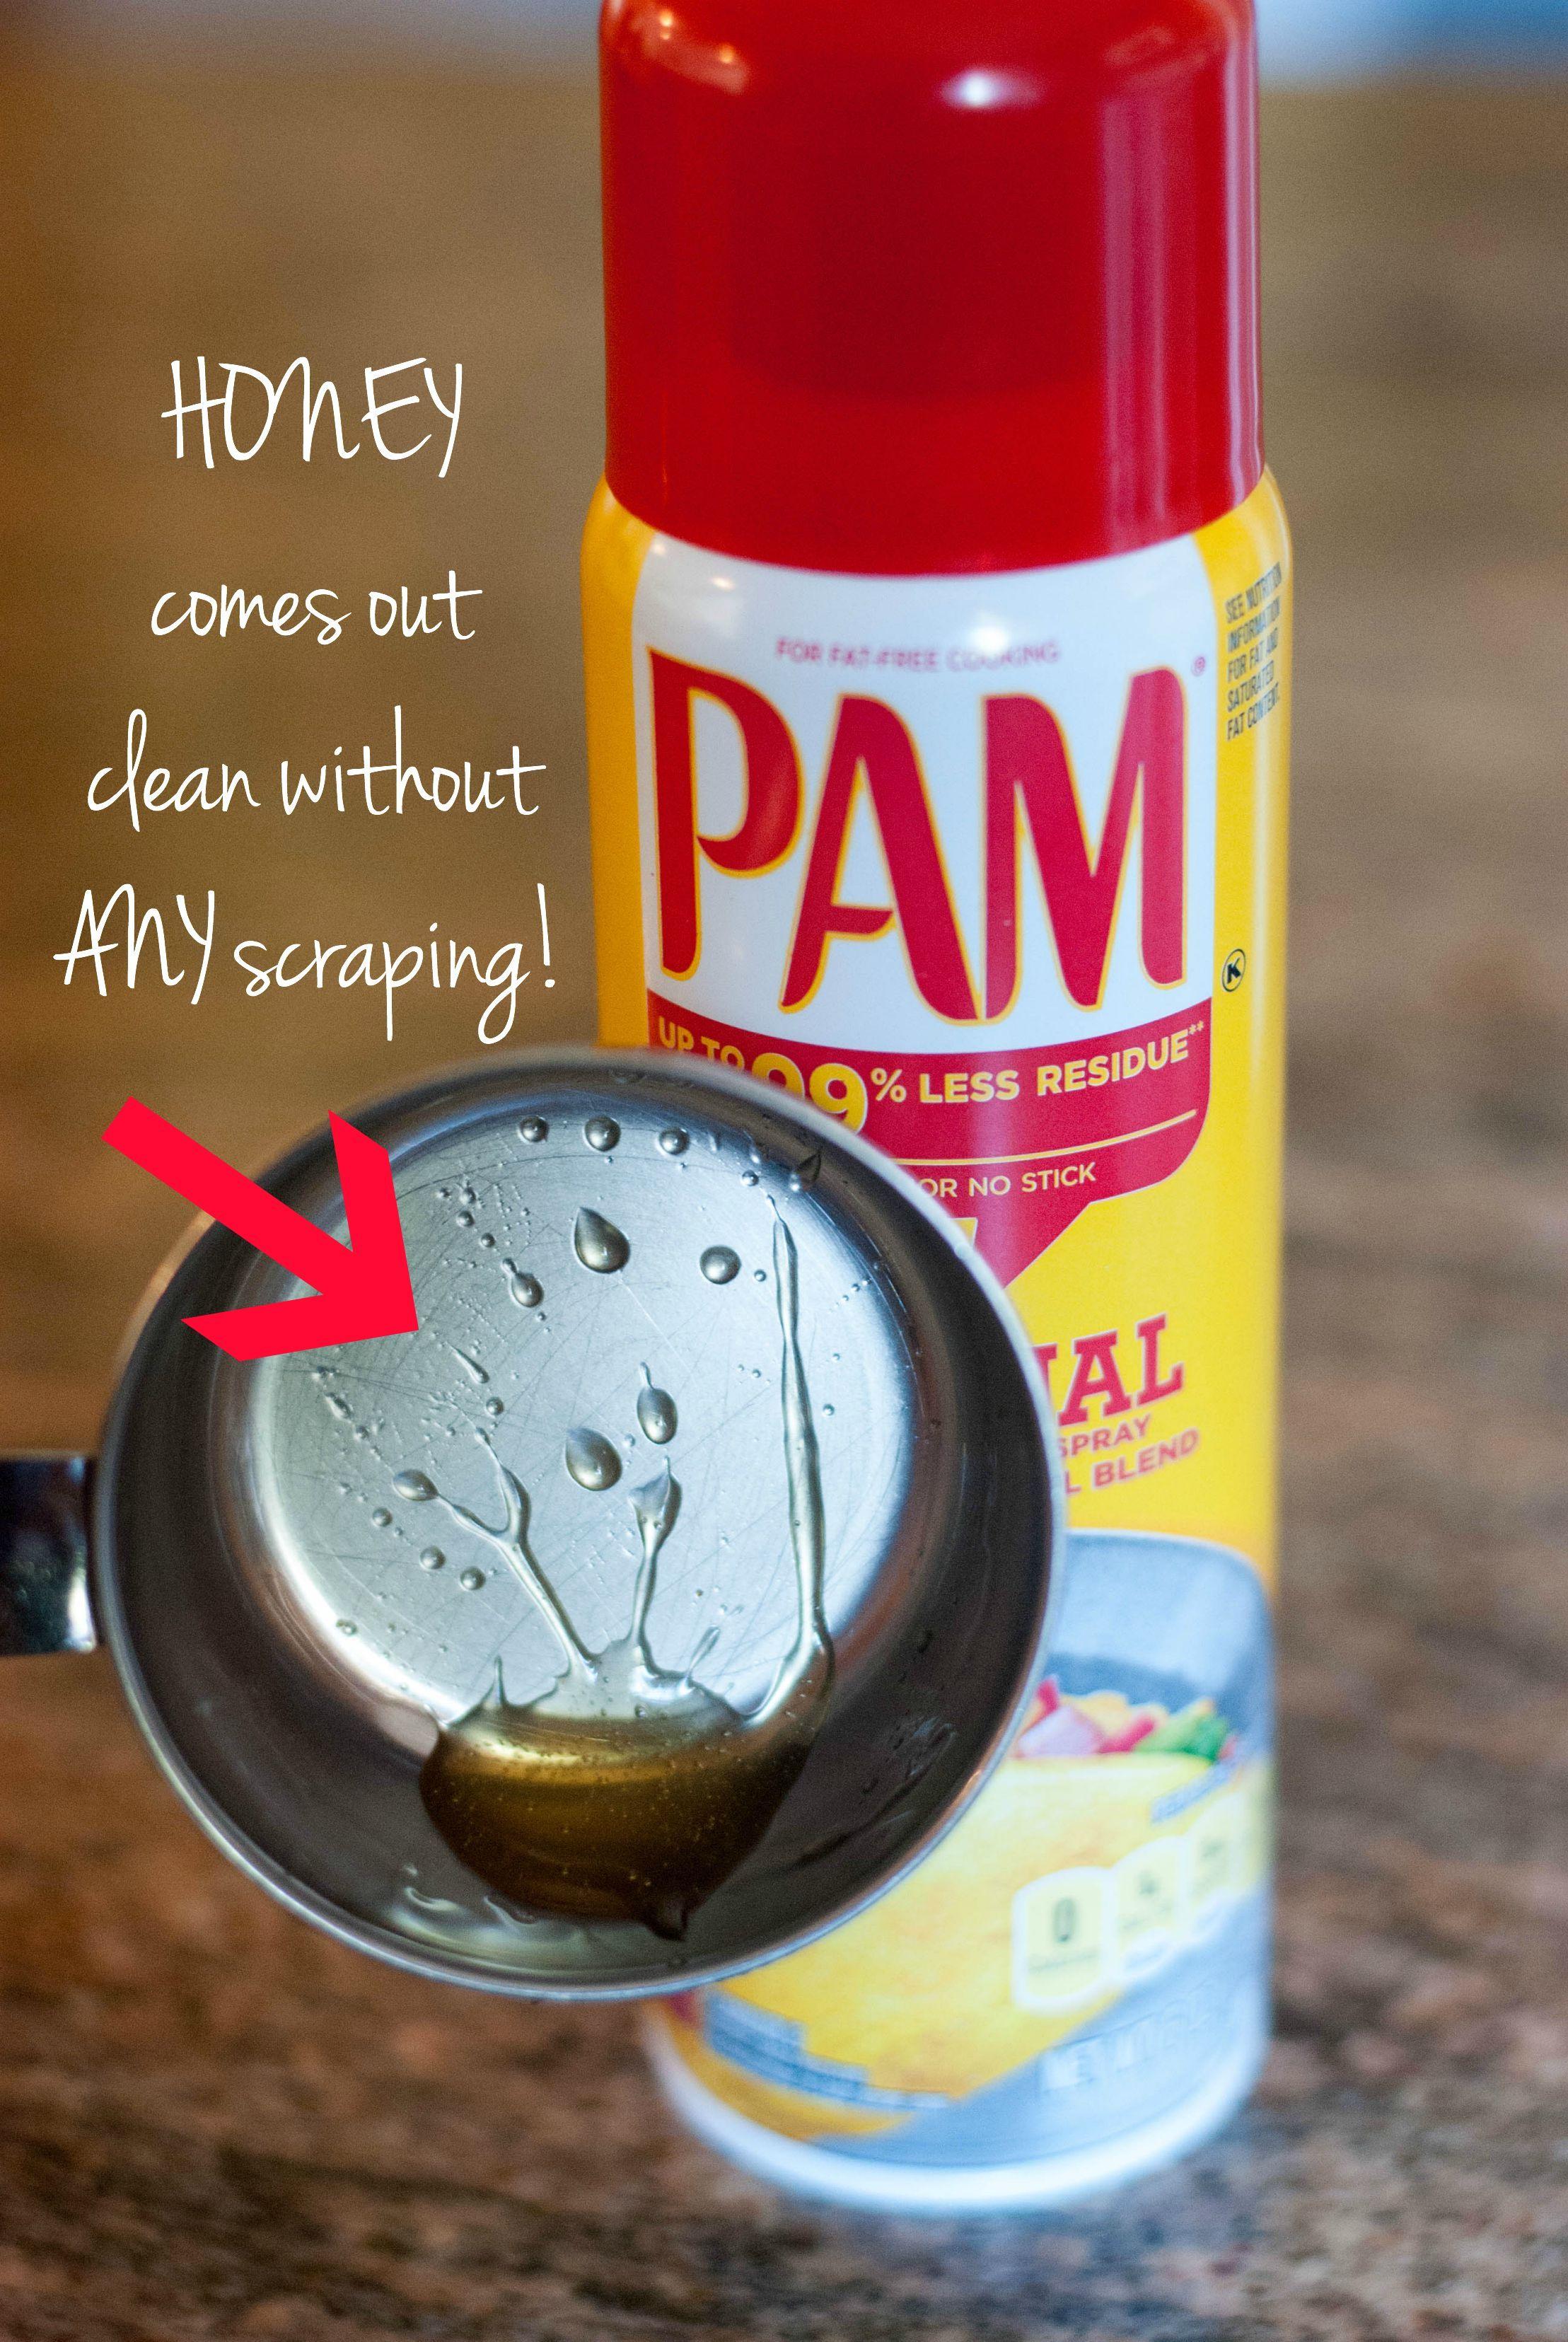 Pam Cooking Spray Kitchen Hacks Tgif This Grandma Is Fun Pam Cooking Spray Cooking Sprays Kitchen Hacks